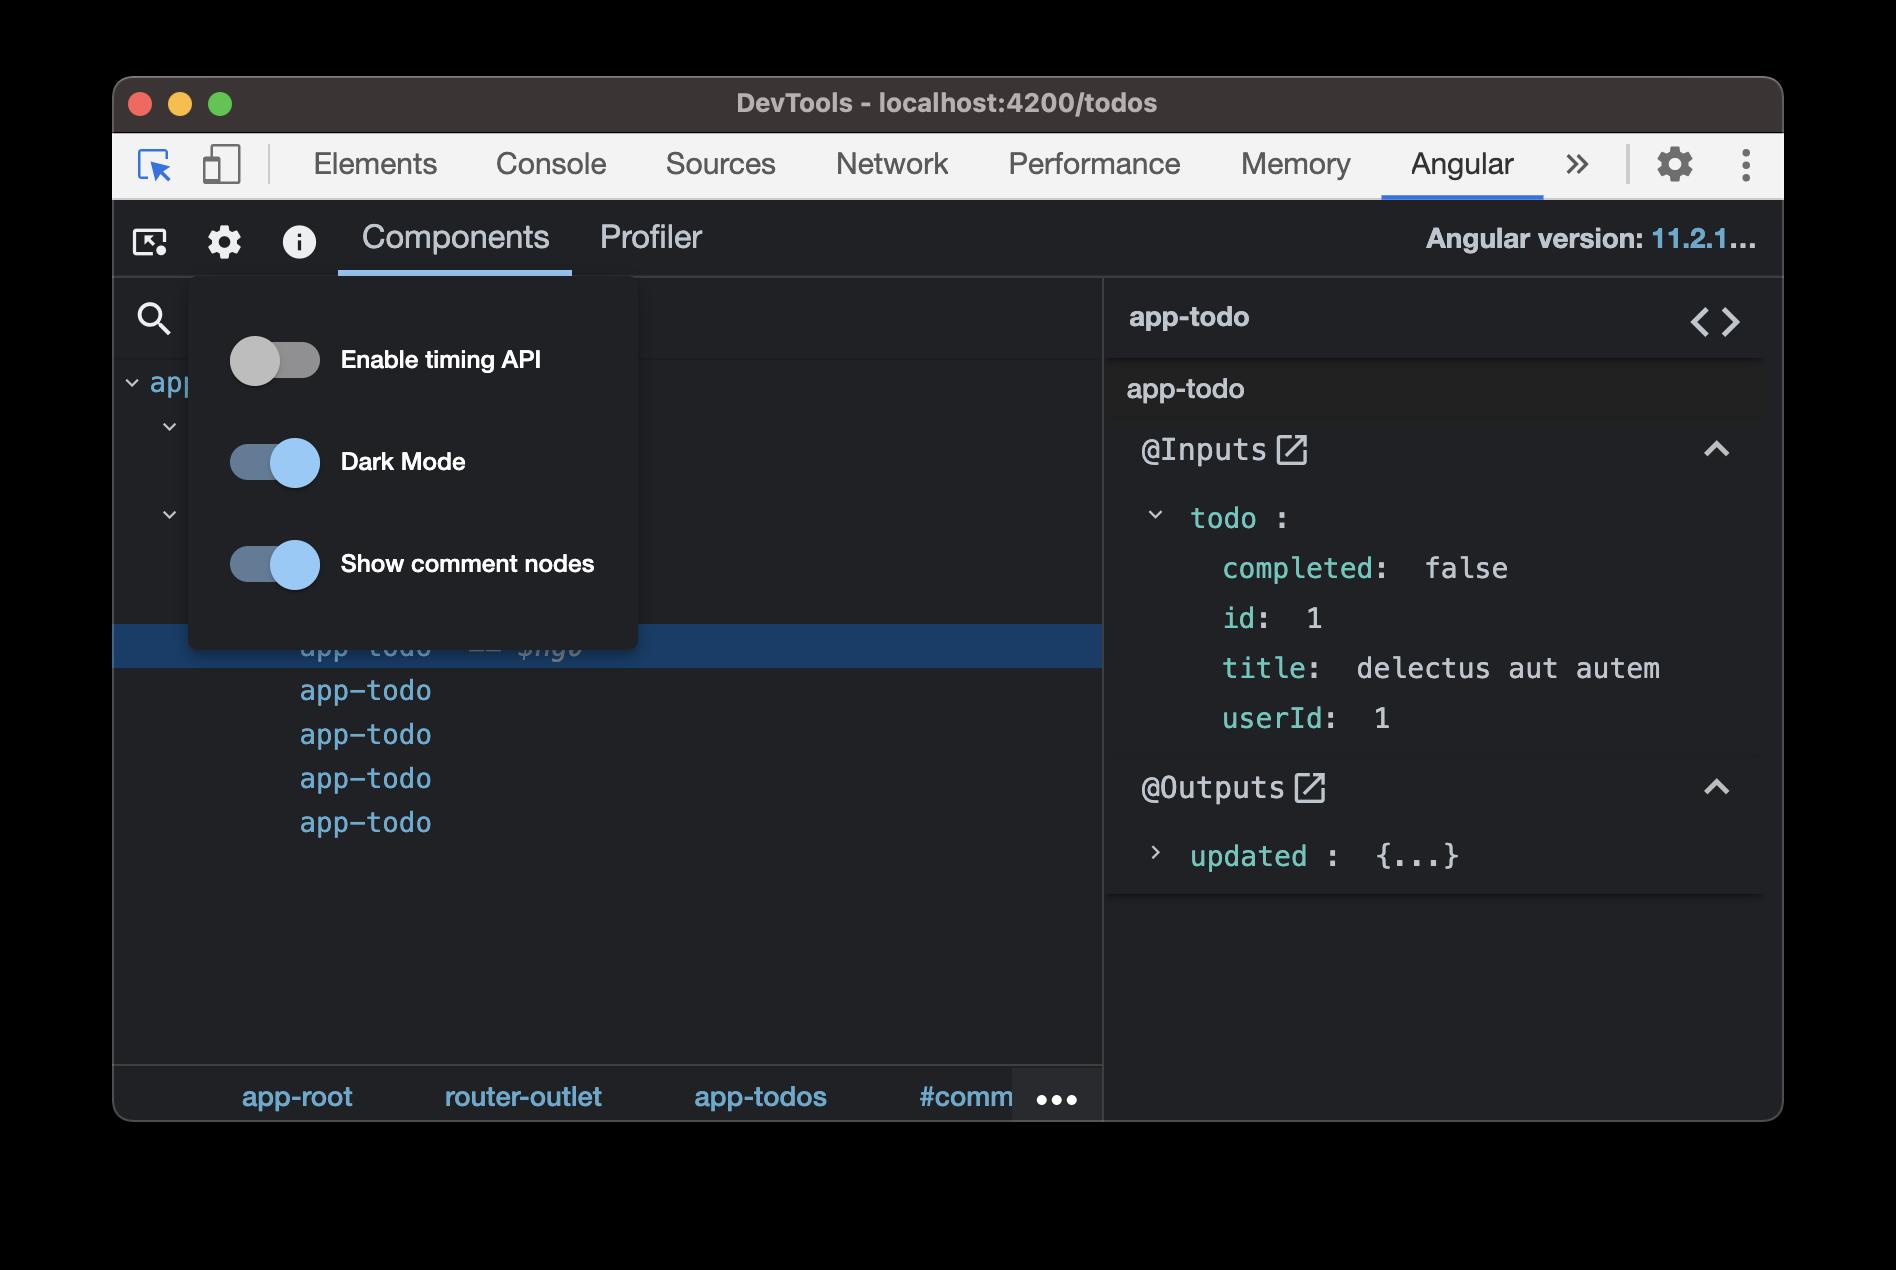 Angular dev tools options menu